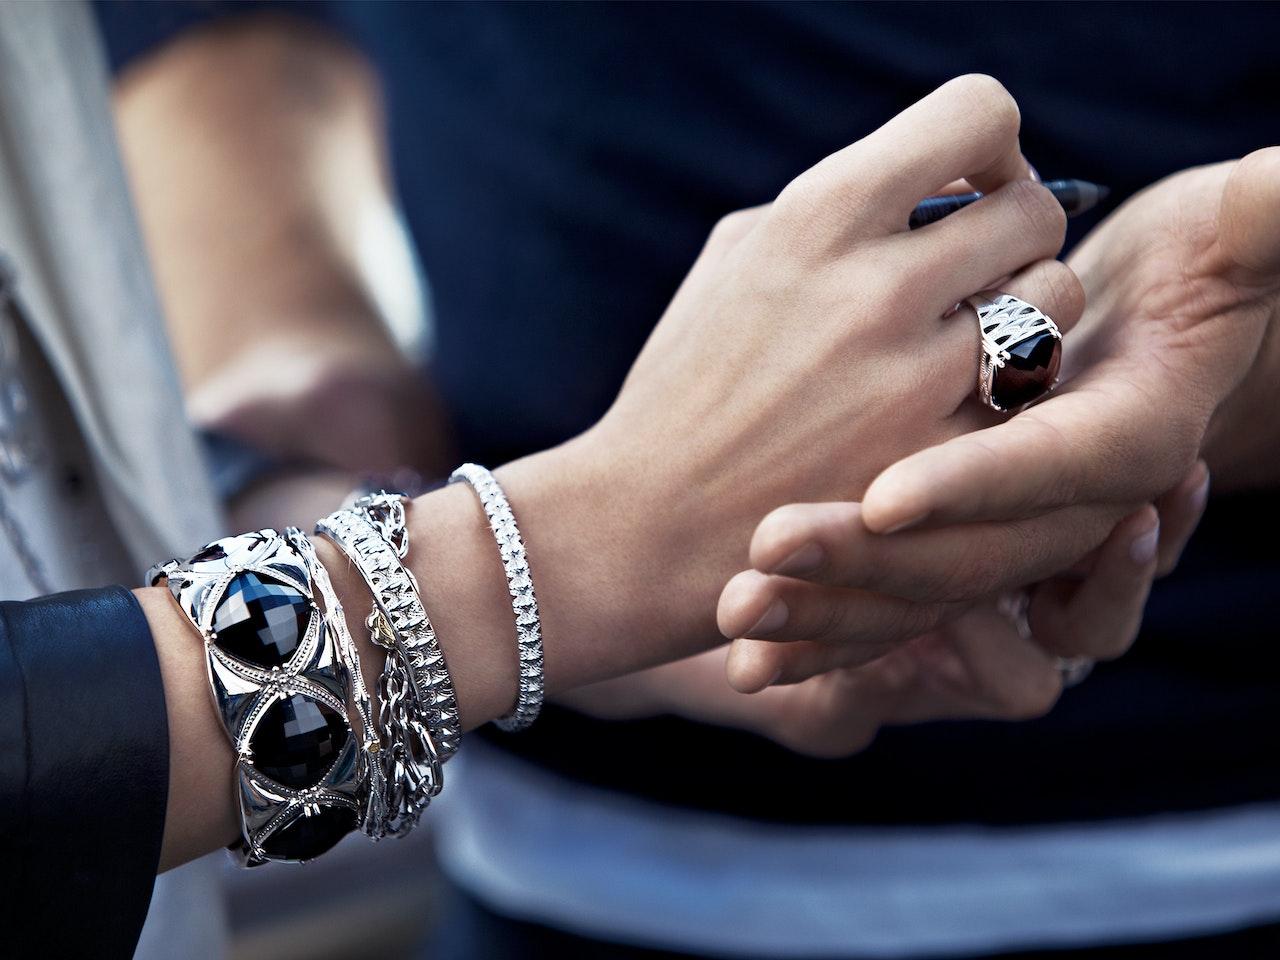 Fashion - TACORI Jewellery  /  Photographer: Thomas Nützl